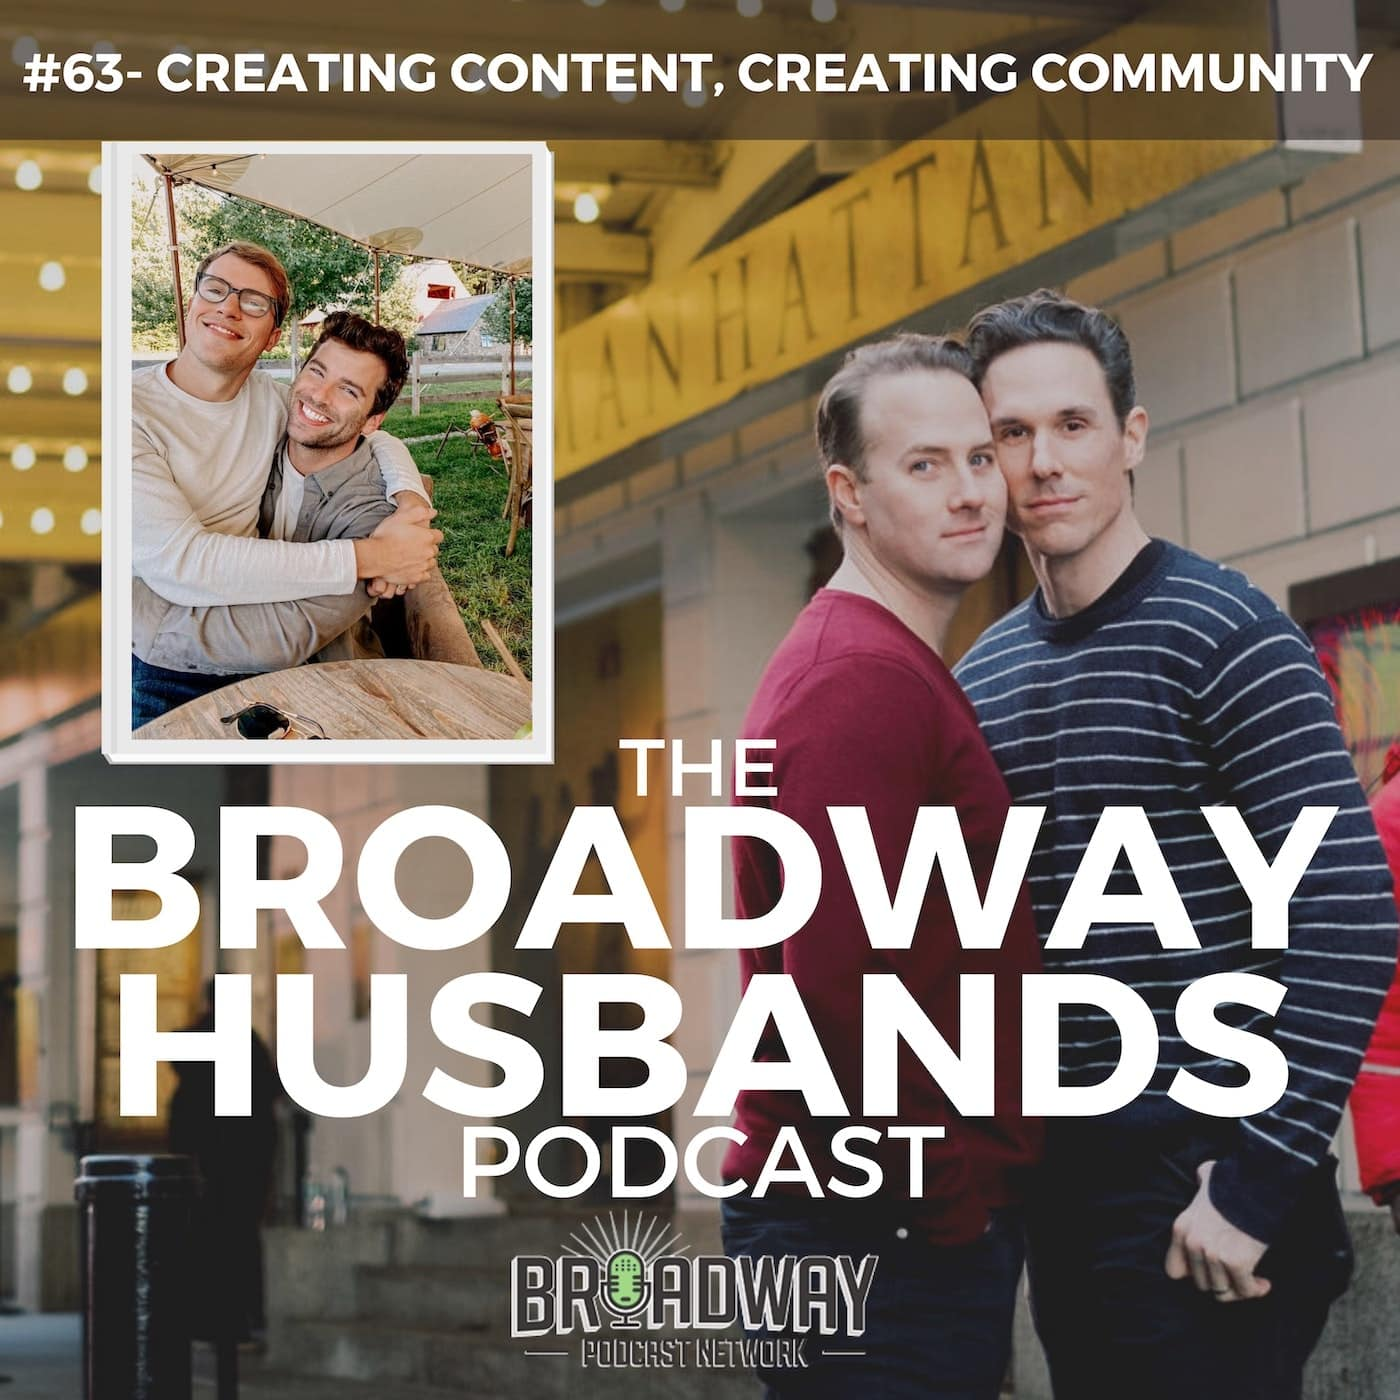 #63 - Creating Content, Creating Community